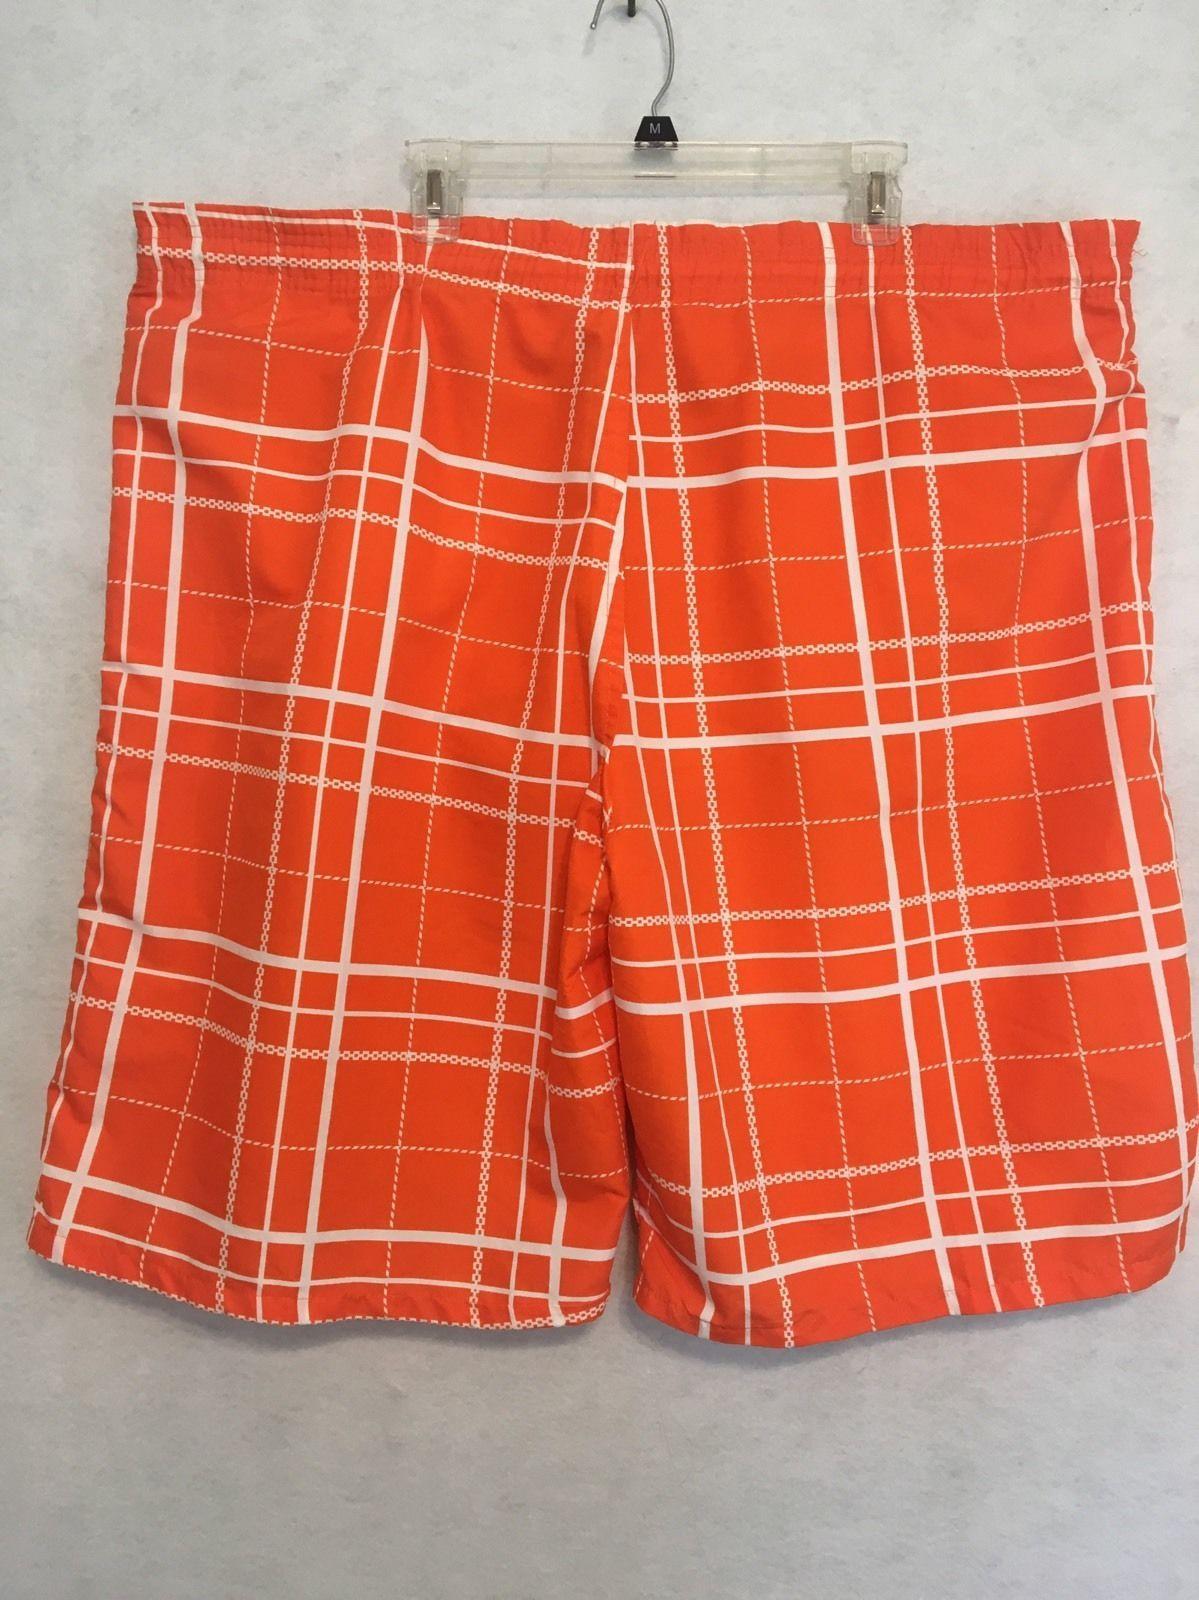 86b5b8fcf2 Nbn Gear Orange White Cargo Swim Trunks Mens and 50 similar items